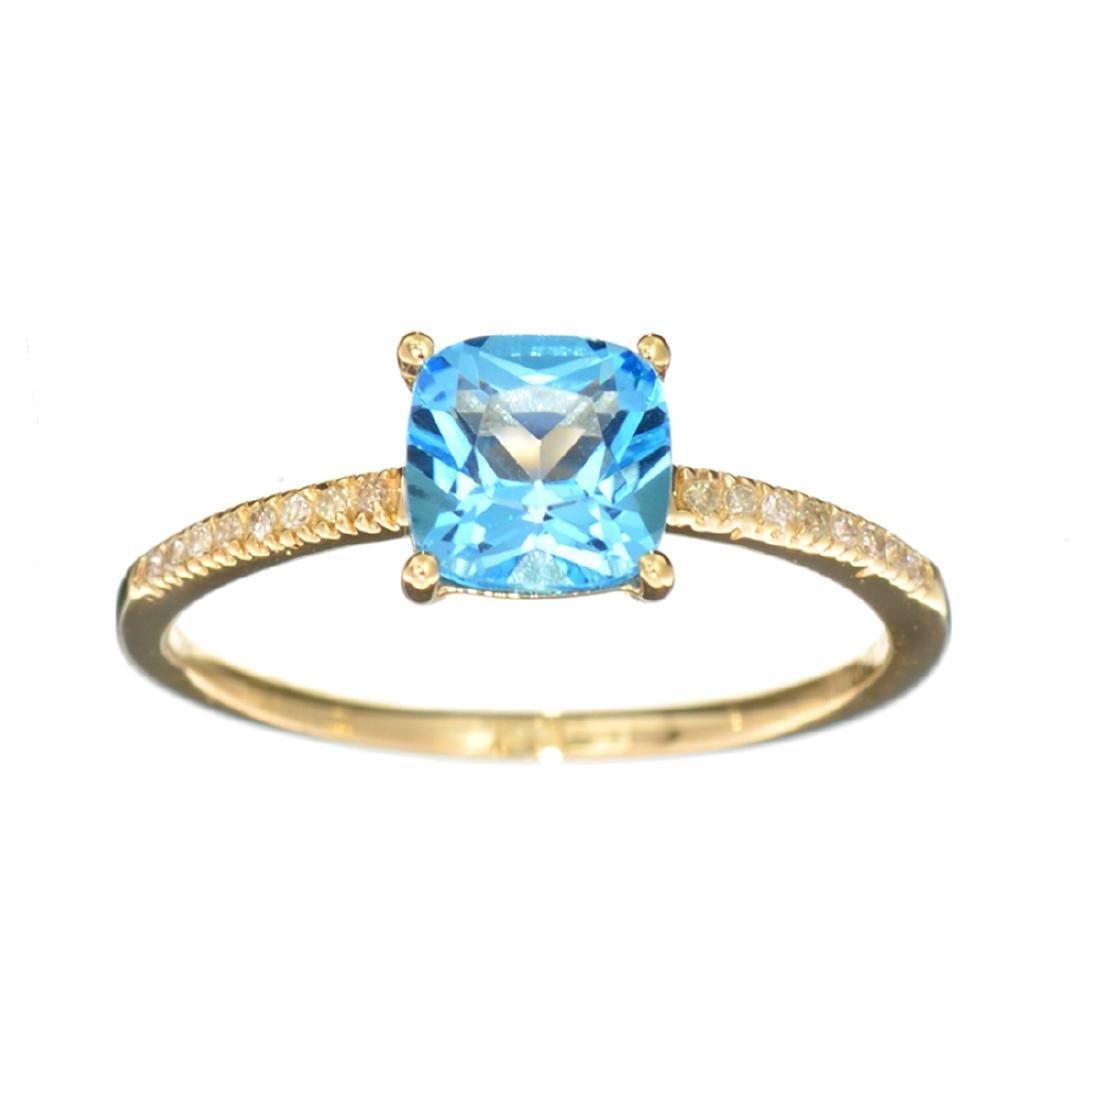 Designer Sebastian 14KT Gold, Cushion Cut Blue Topaz